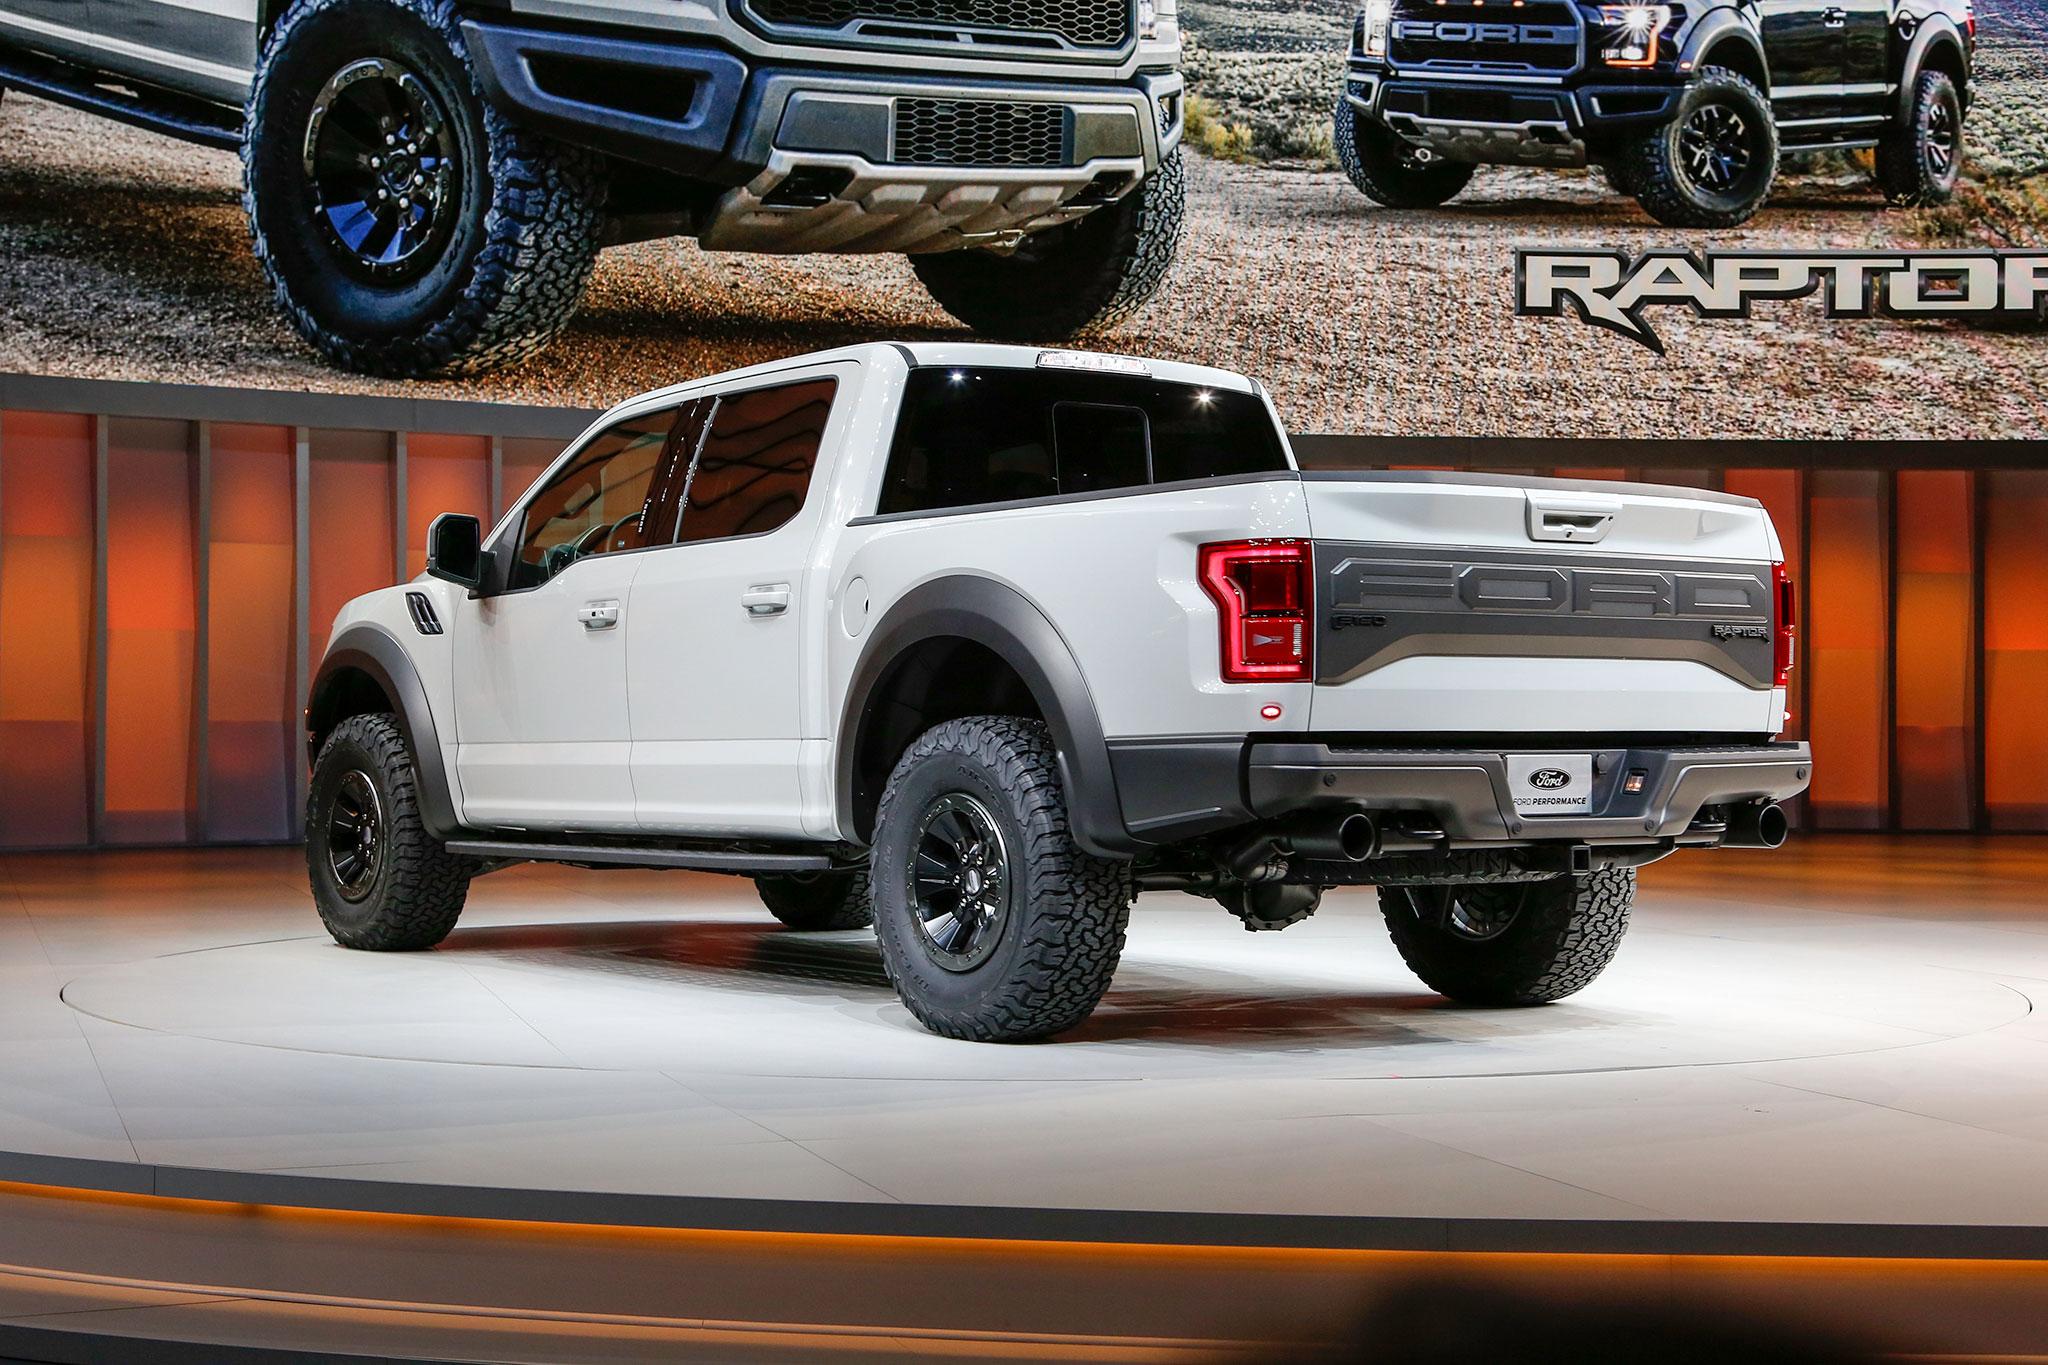 raptor ford 150 supercrew f150 cab svt exterior redesign pickup mpg specs muscle rear awd premier trucks update vistazo primer